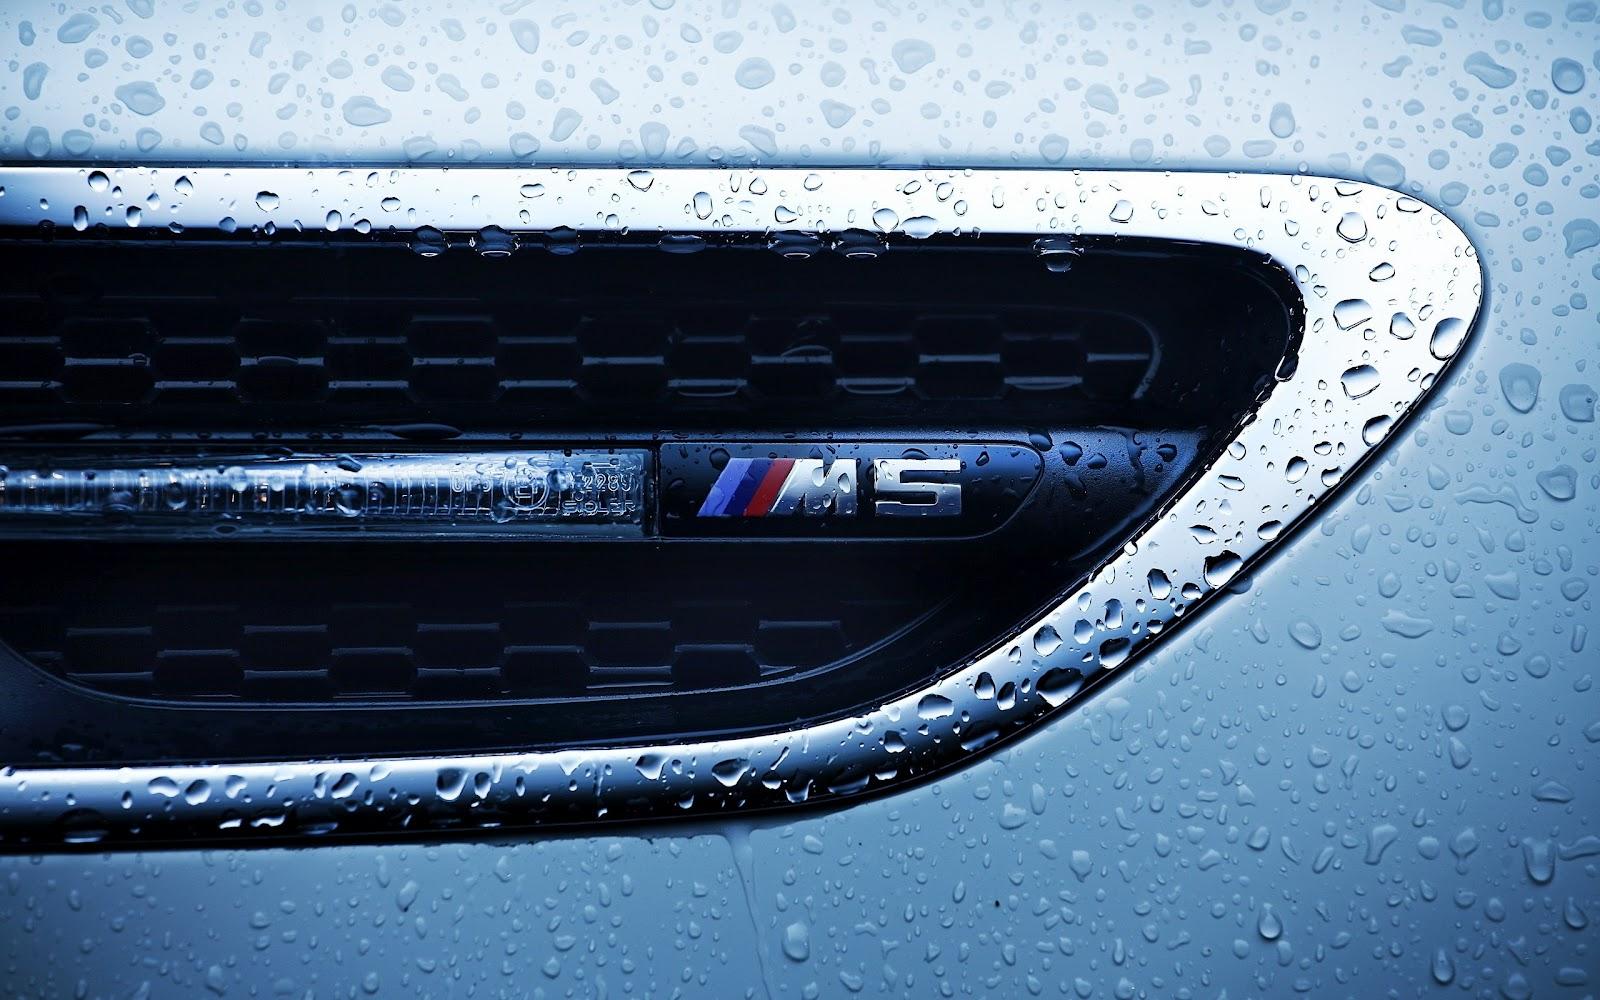 Bmw M5 Logo Close Up Water Drops Hd Car Wallpapers